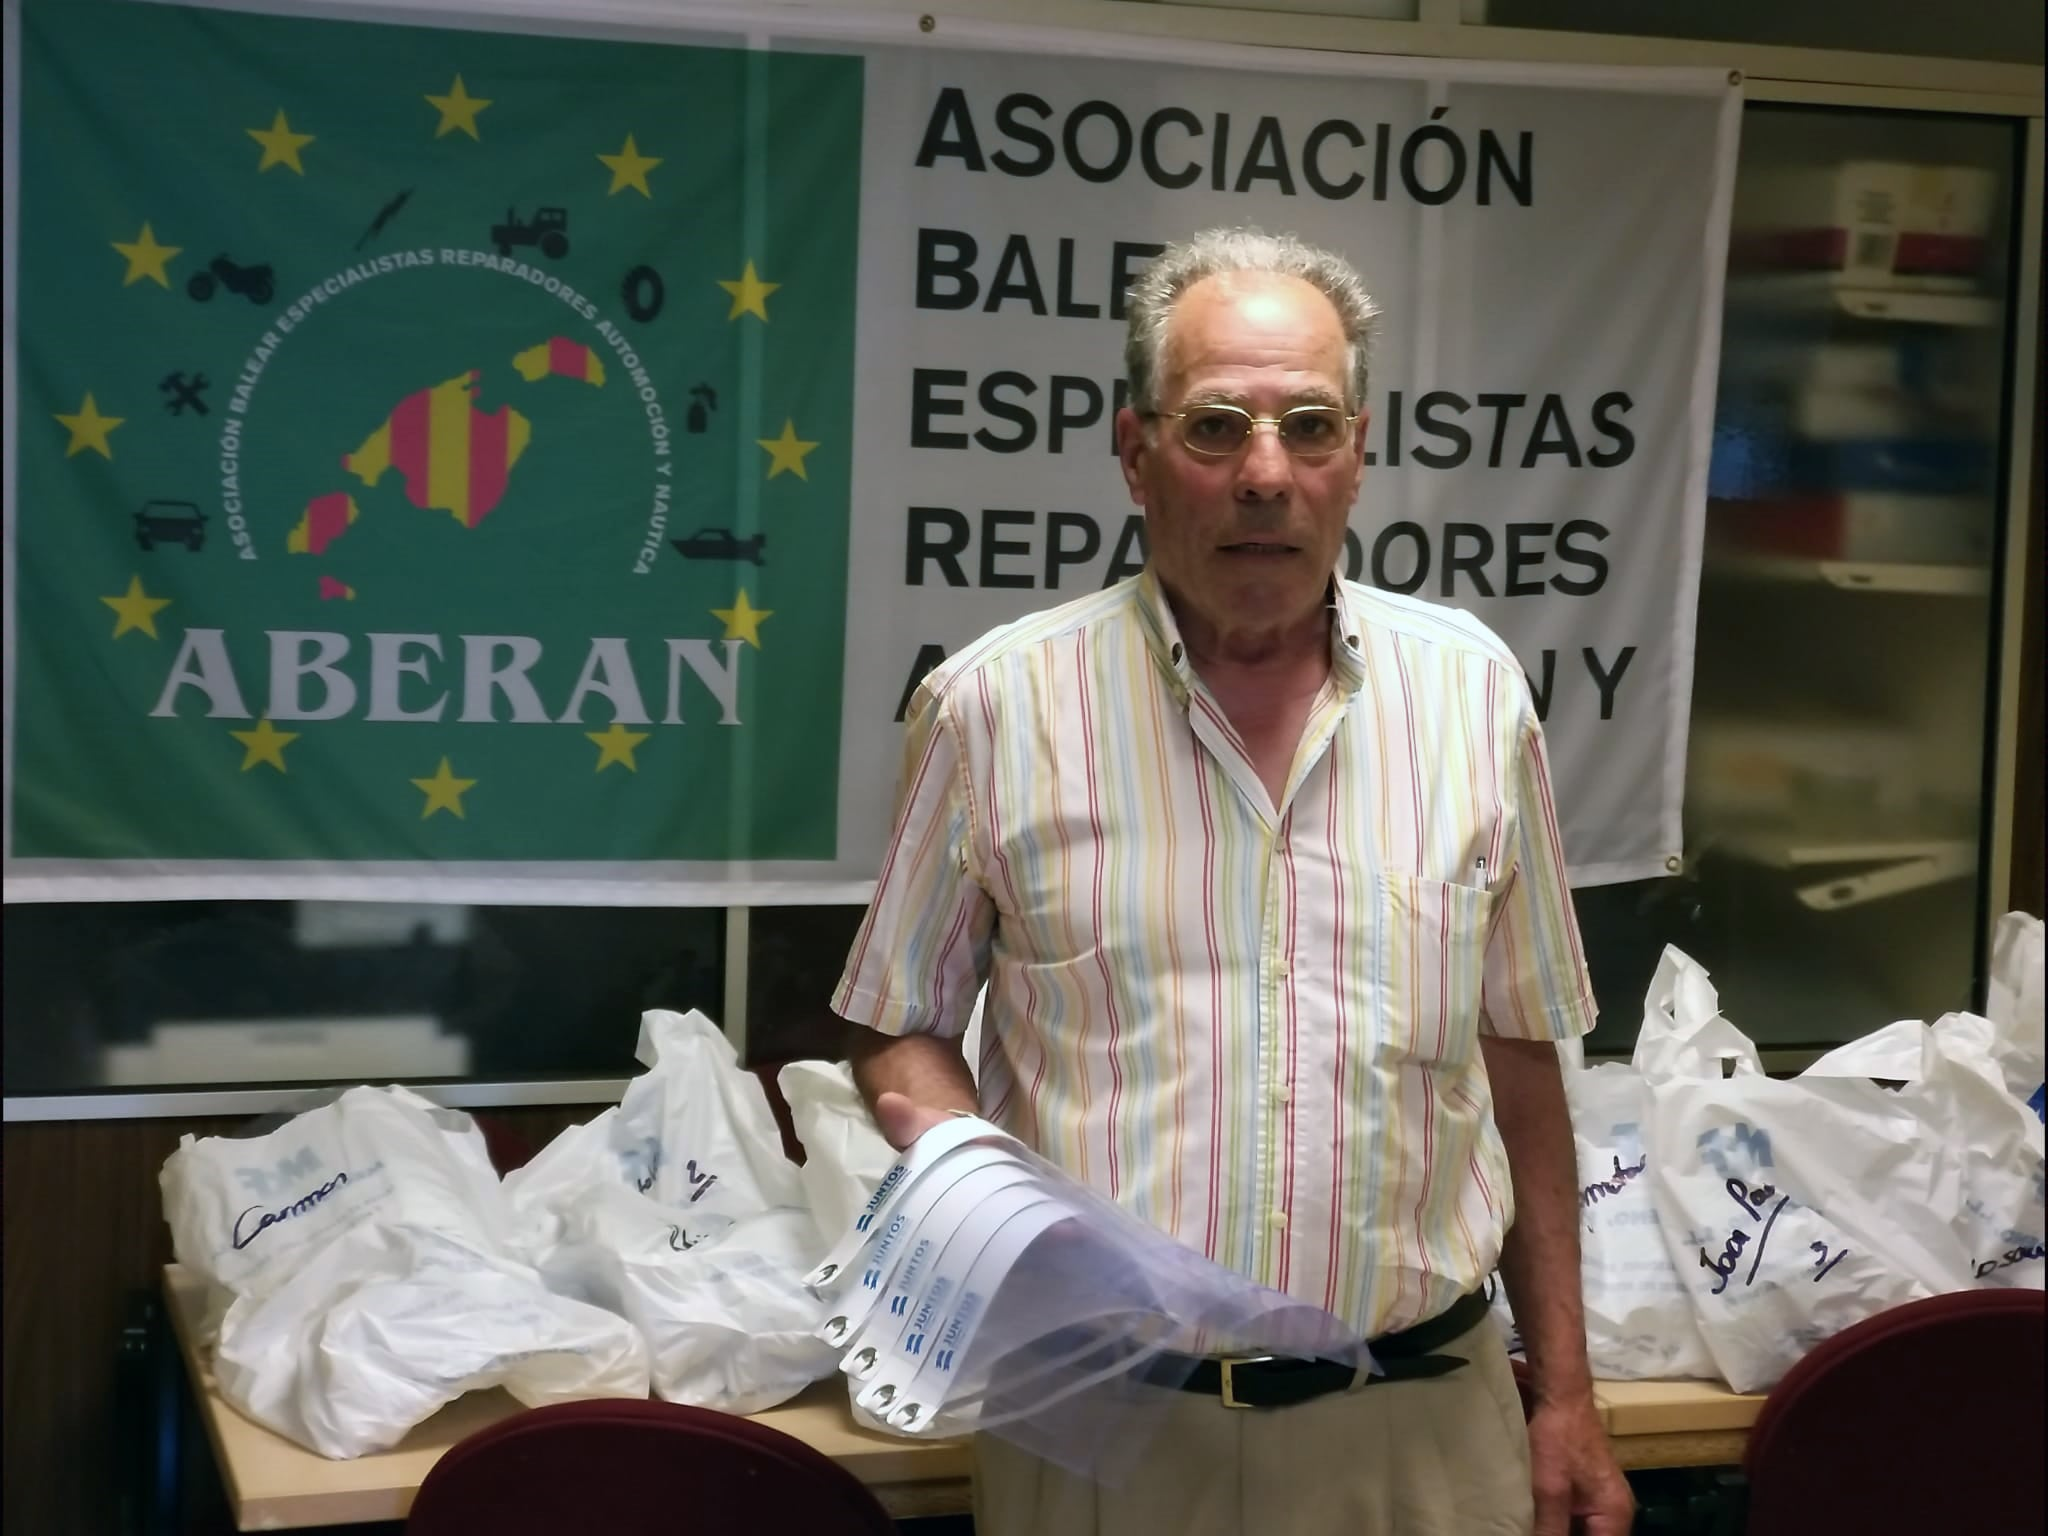 Pie de foto: Julio González, presidente de ABERAN